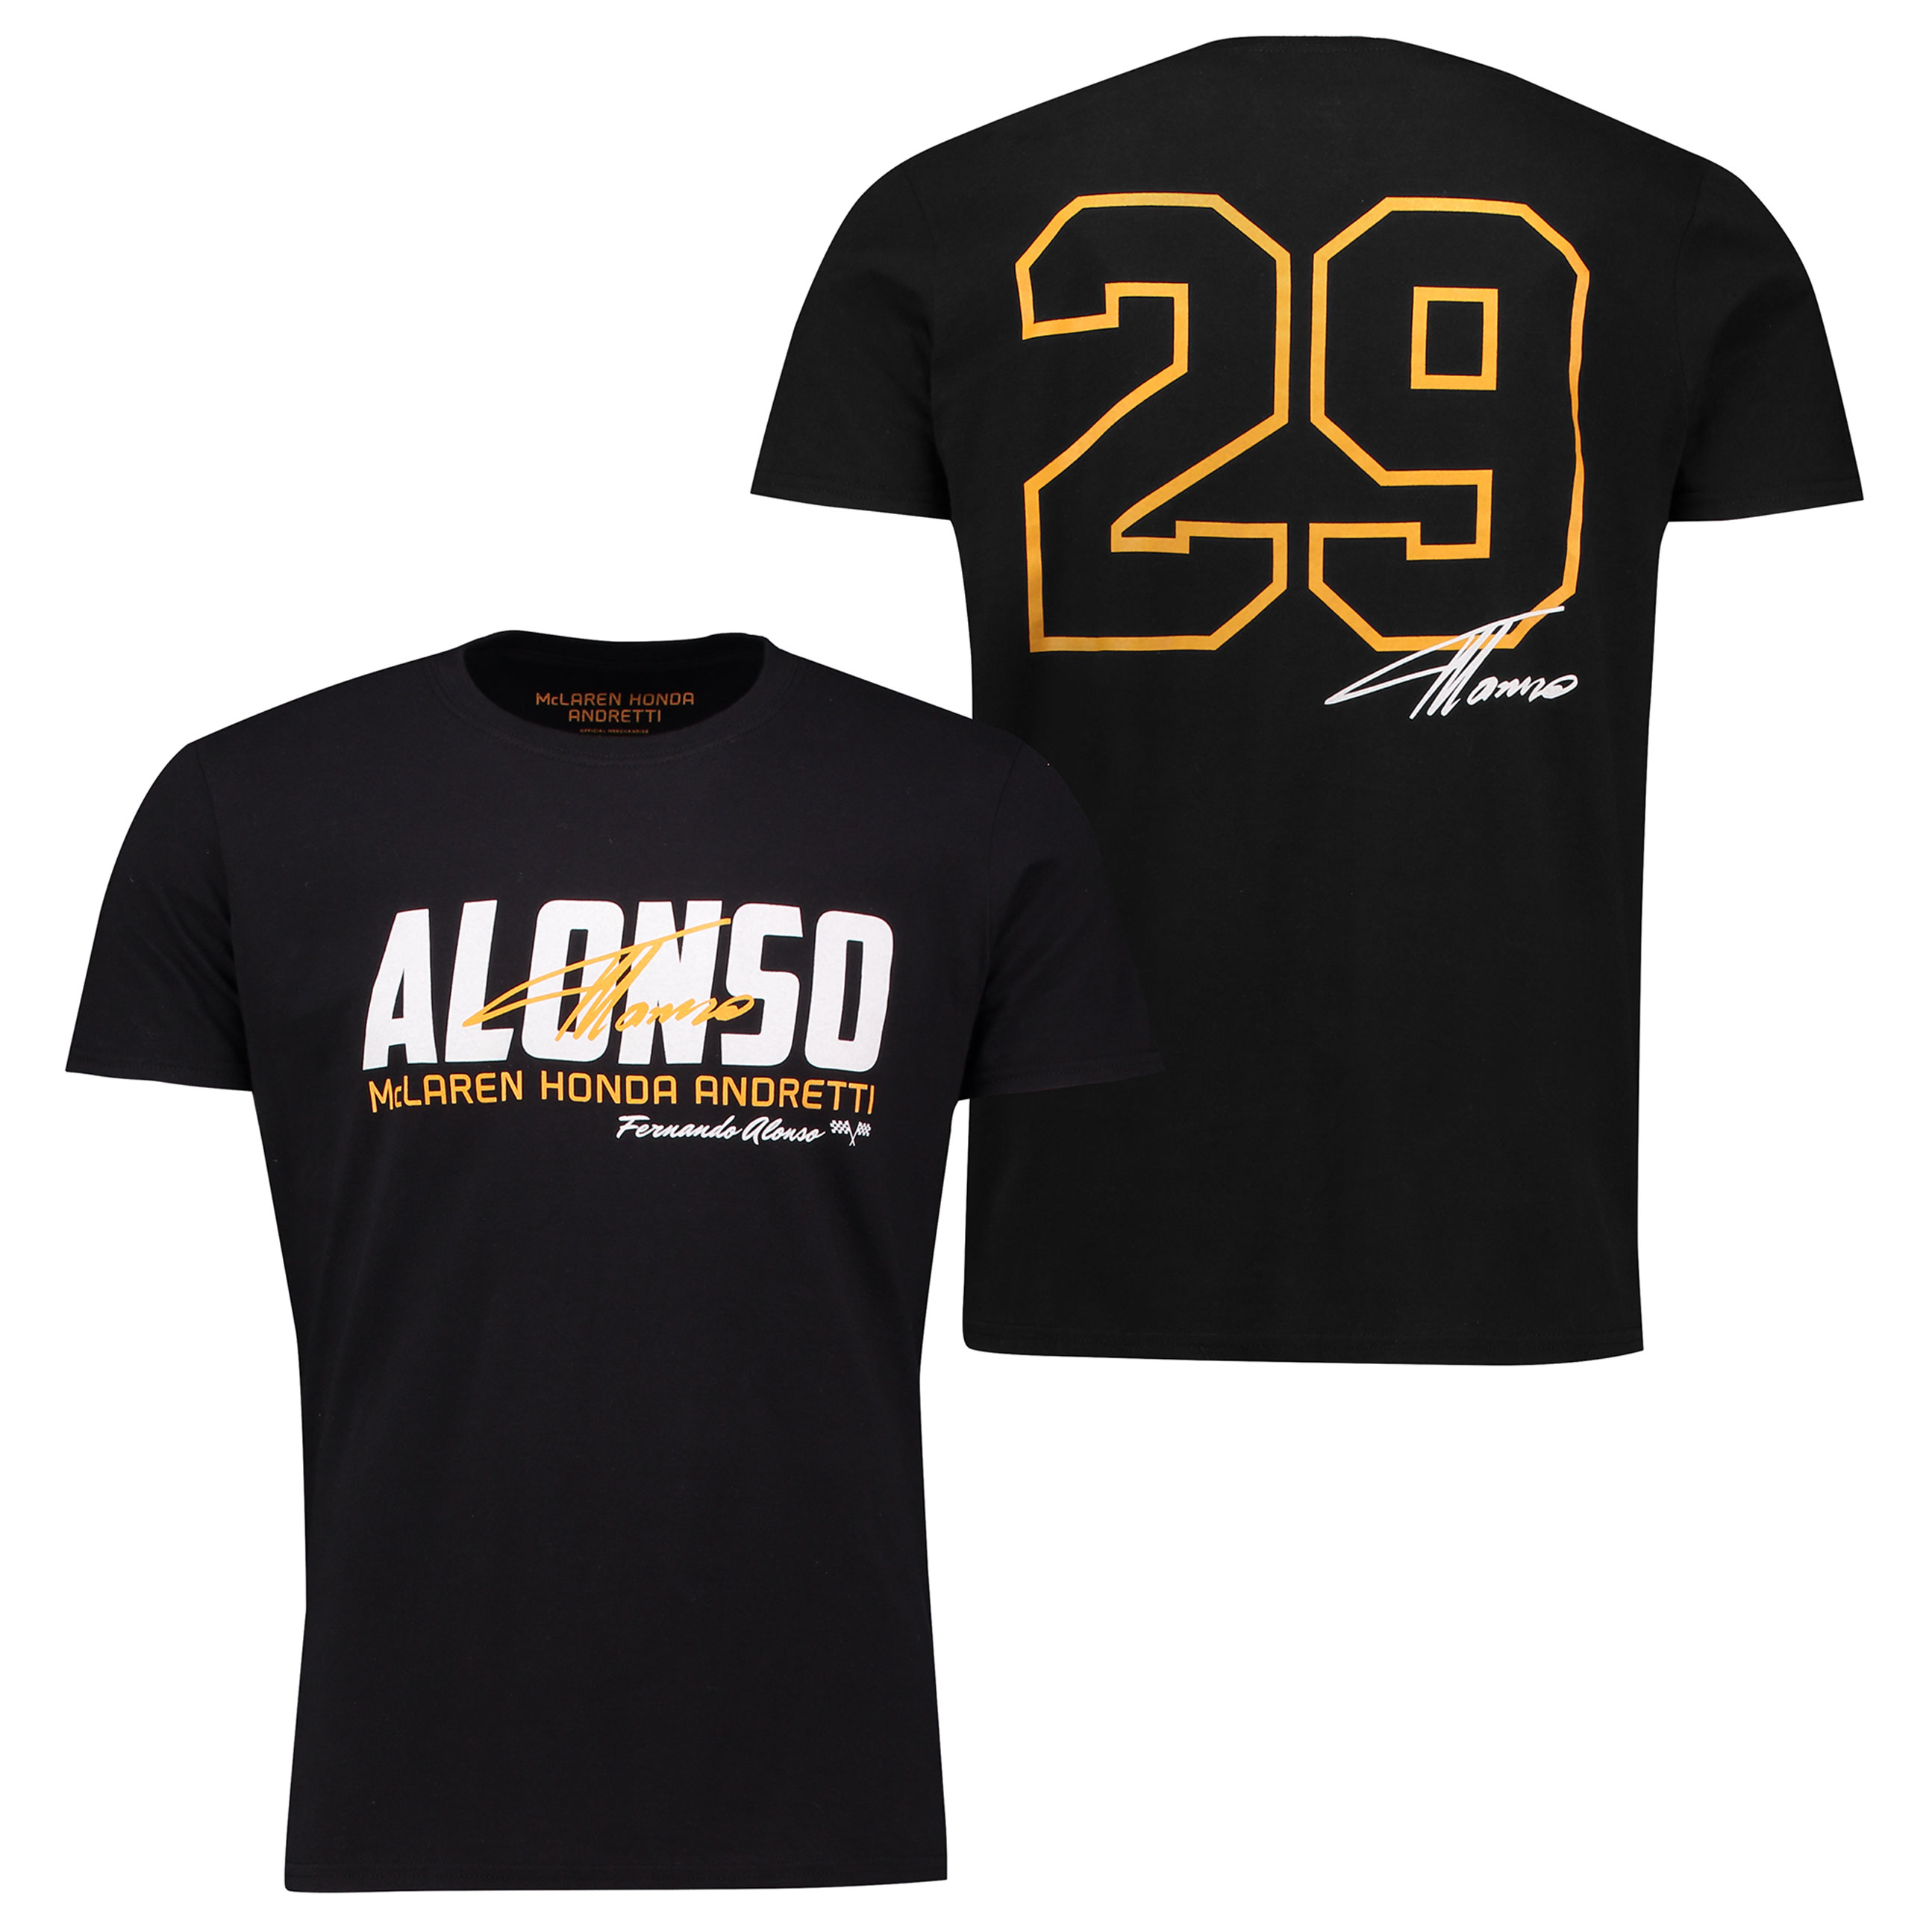 McLaren Honda Andretti Fernando Alonso Indy 500 Signature T-Shirt - Bl